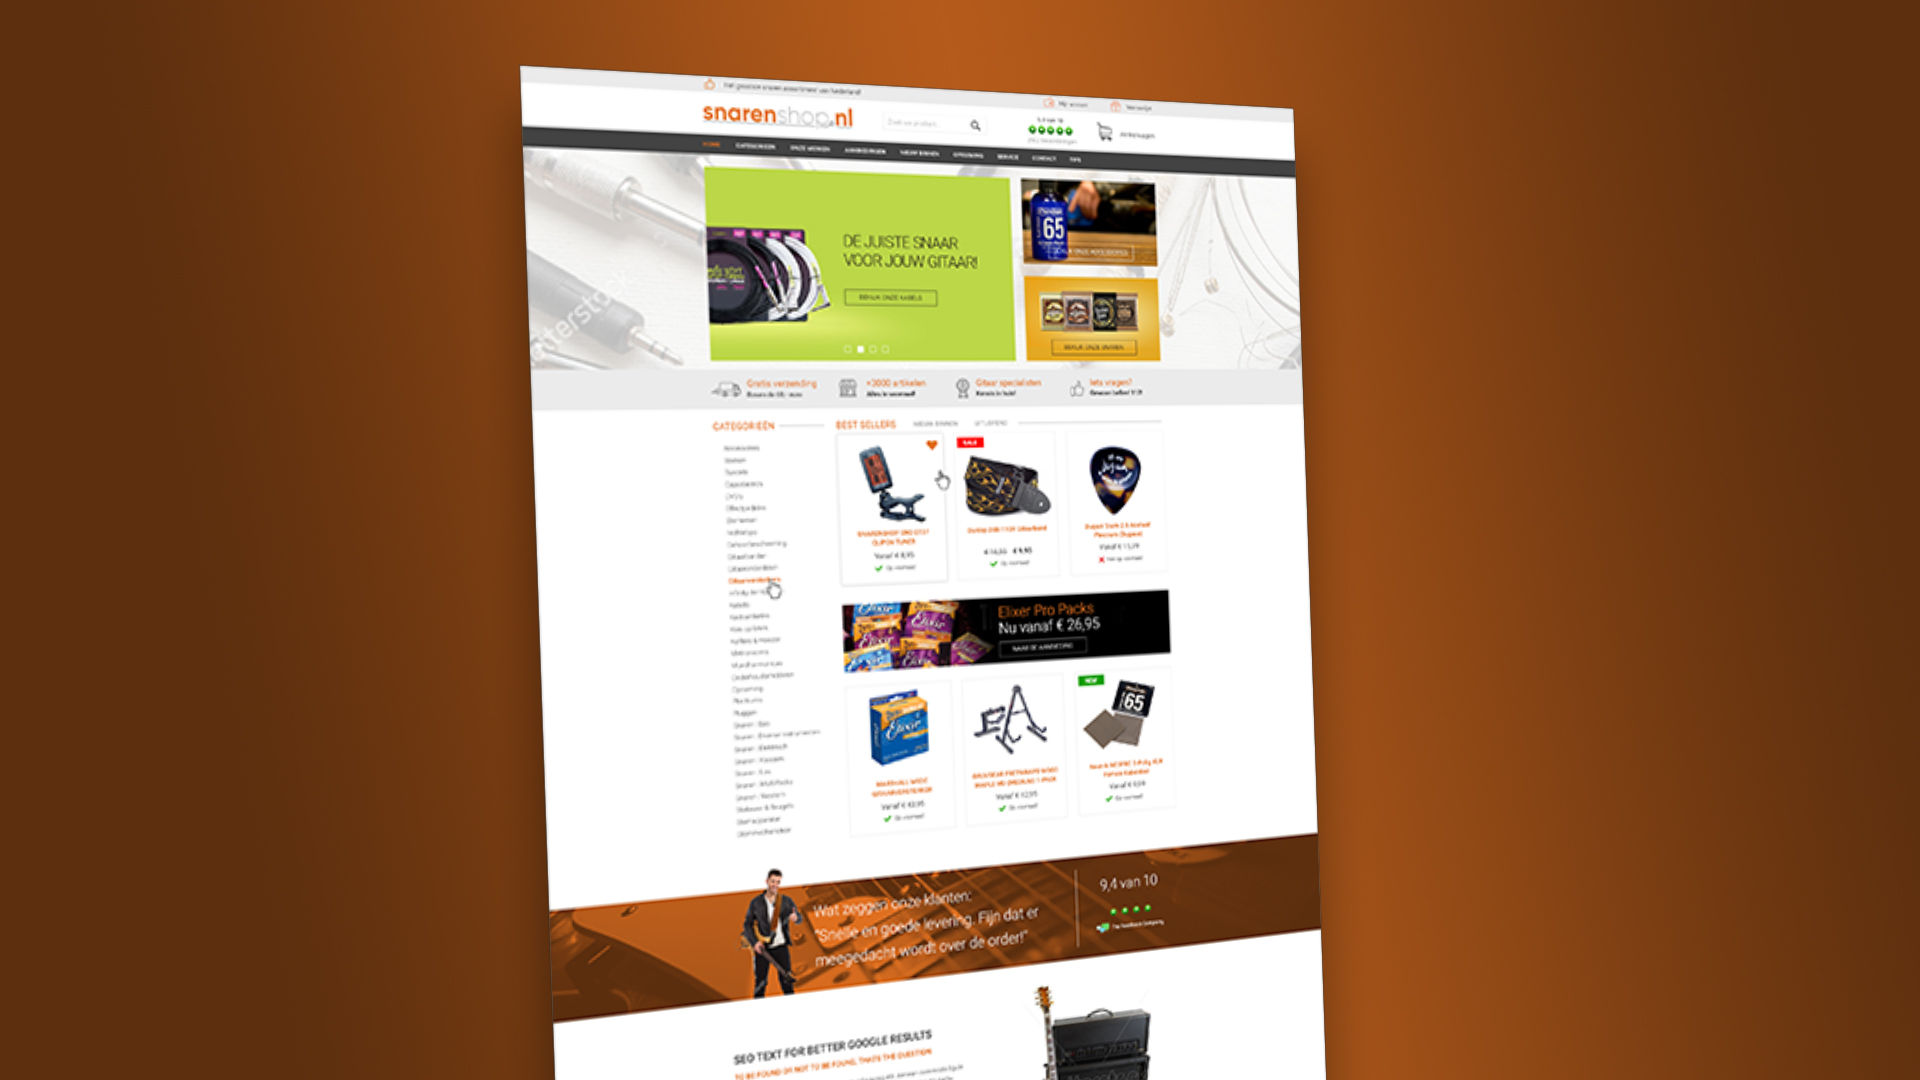 webdesign-woocommerce-wordpress-mockup-3d-responsive-snarenshop